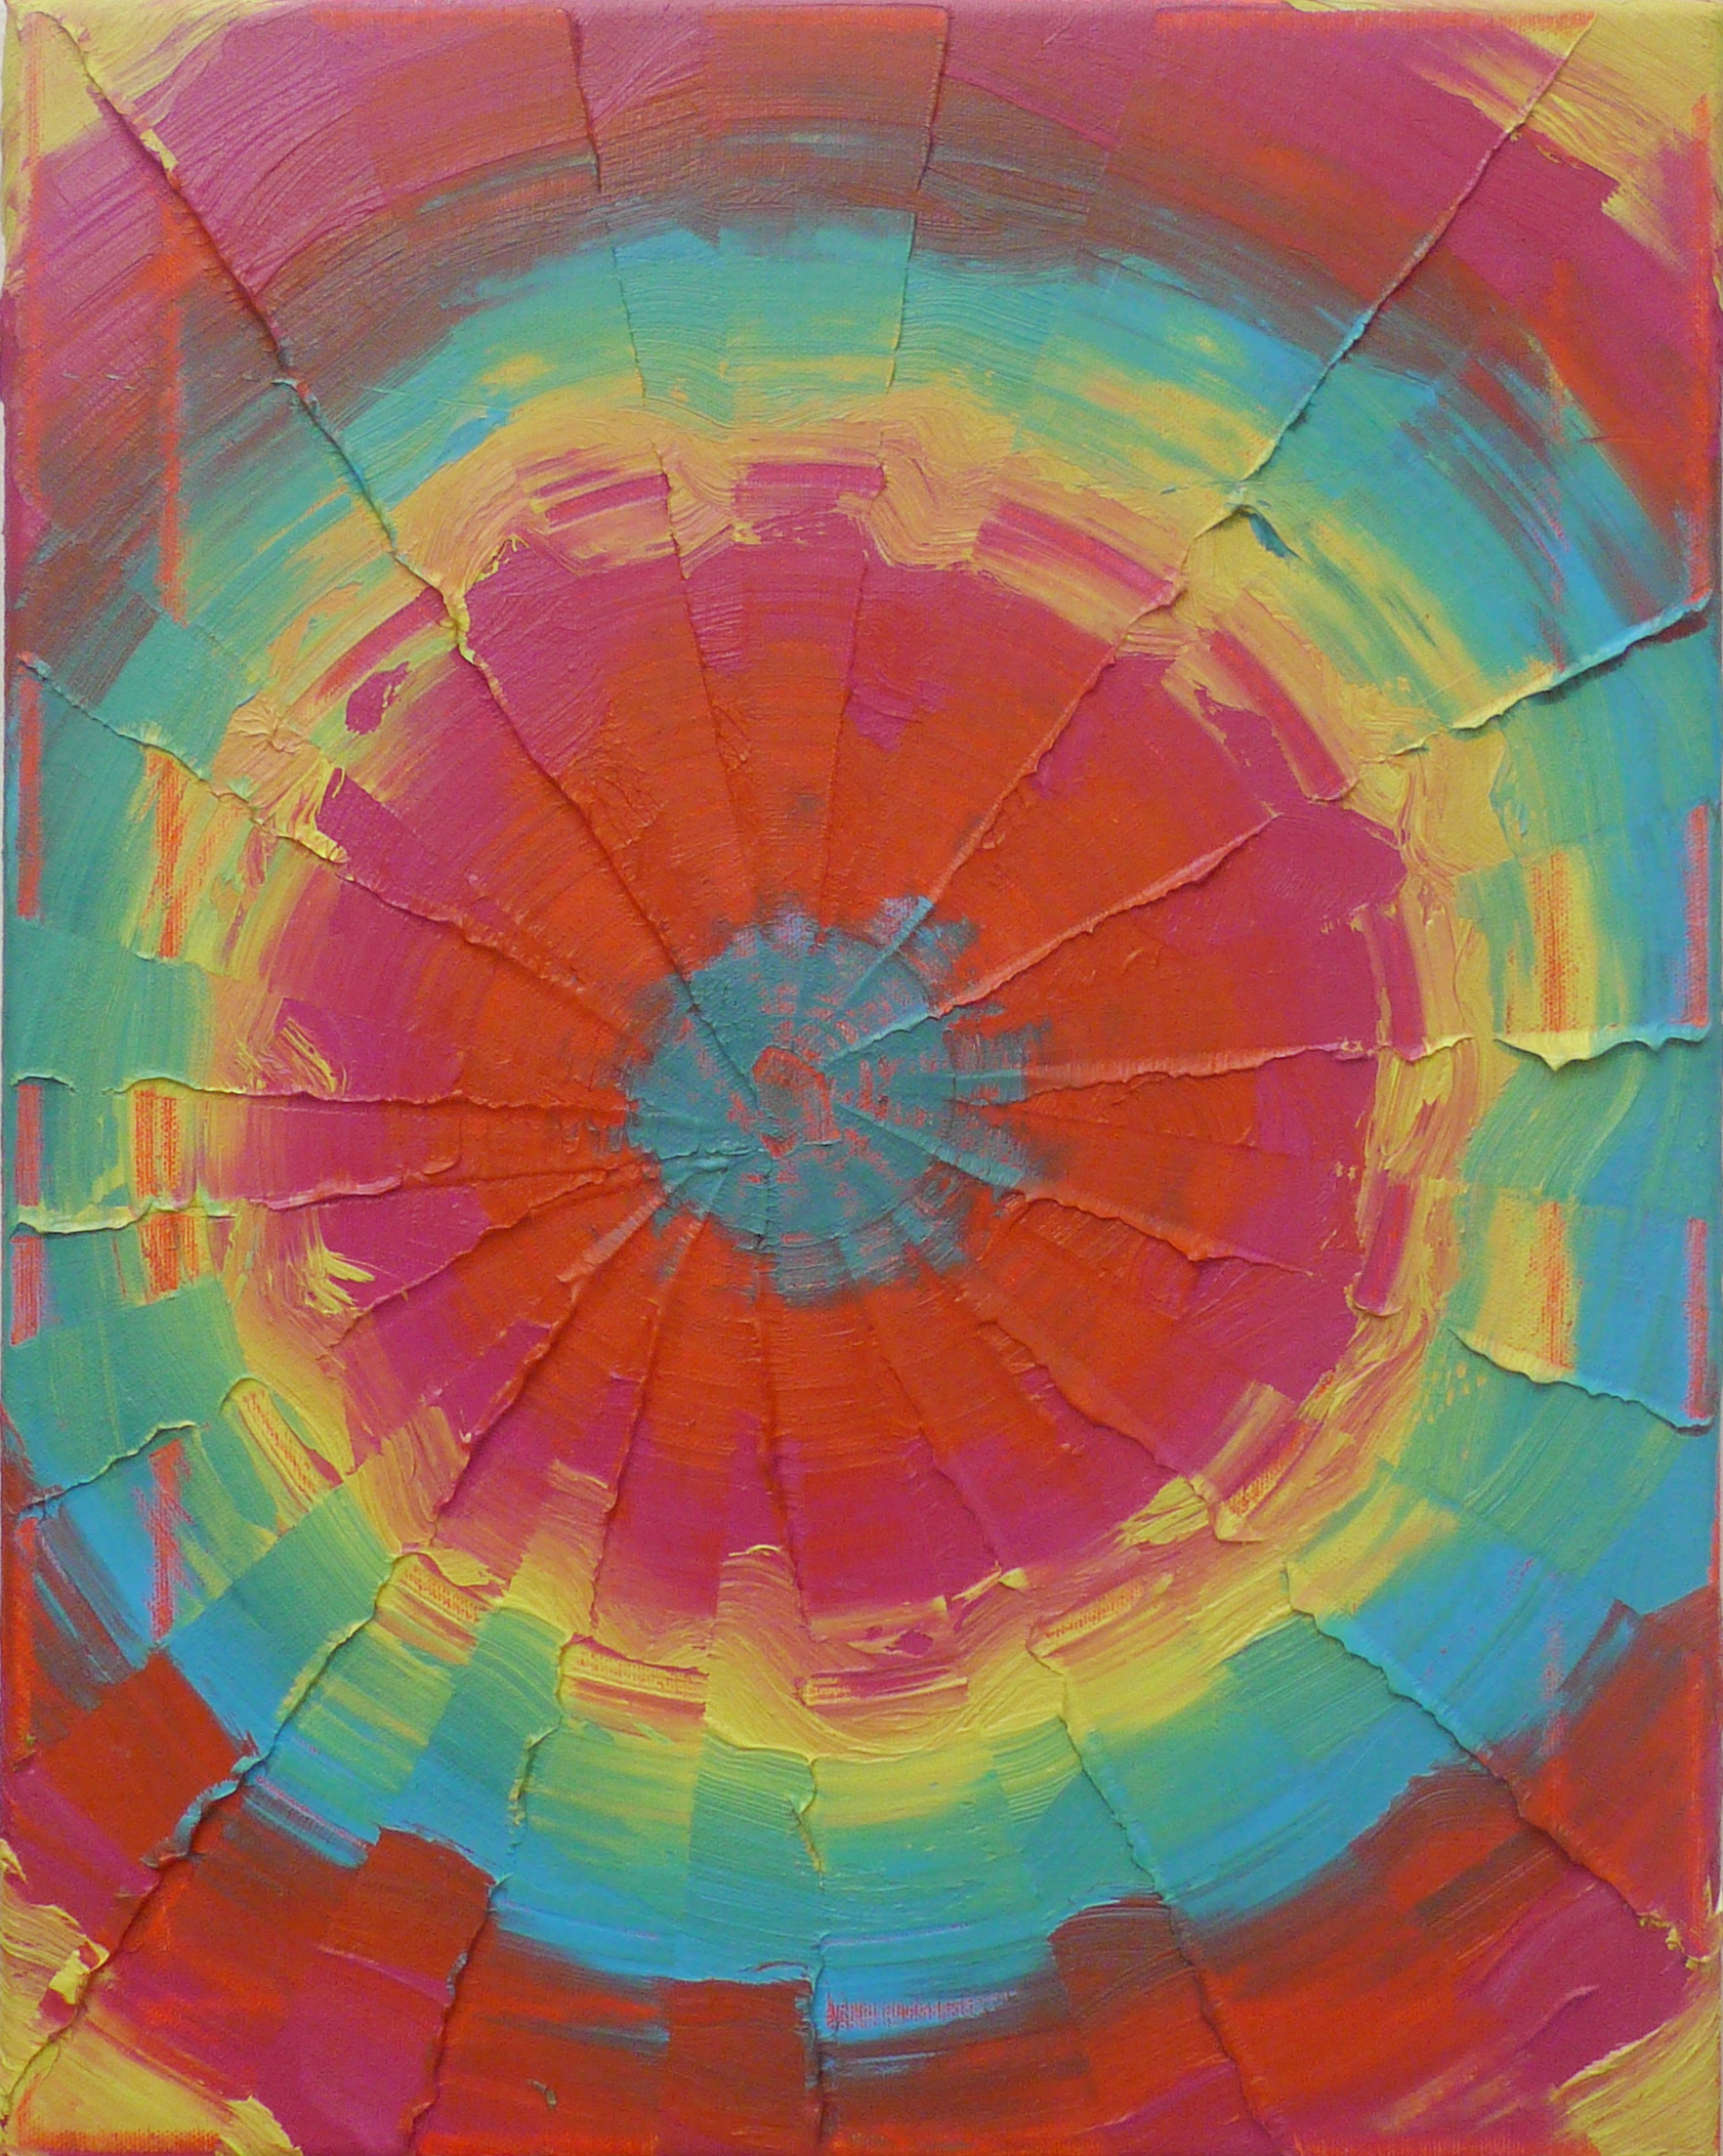 Die 2 , 2013 Oil on canvas, 51x40.5 cm cm